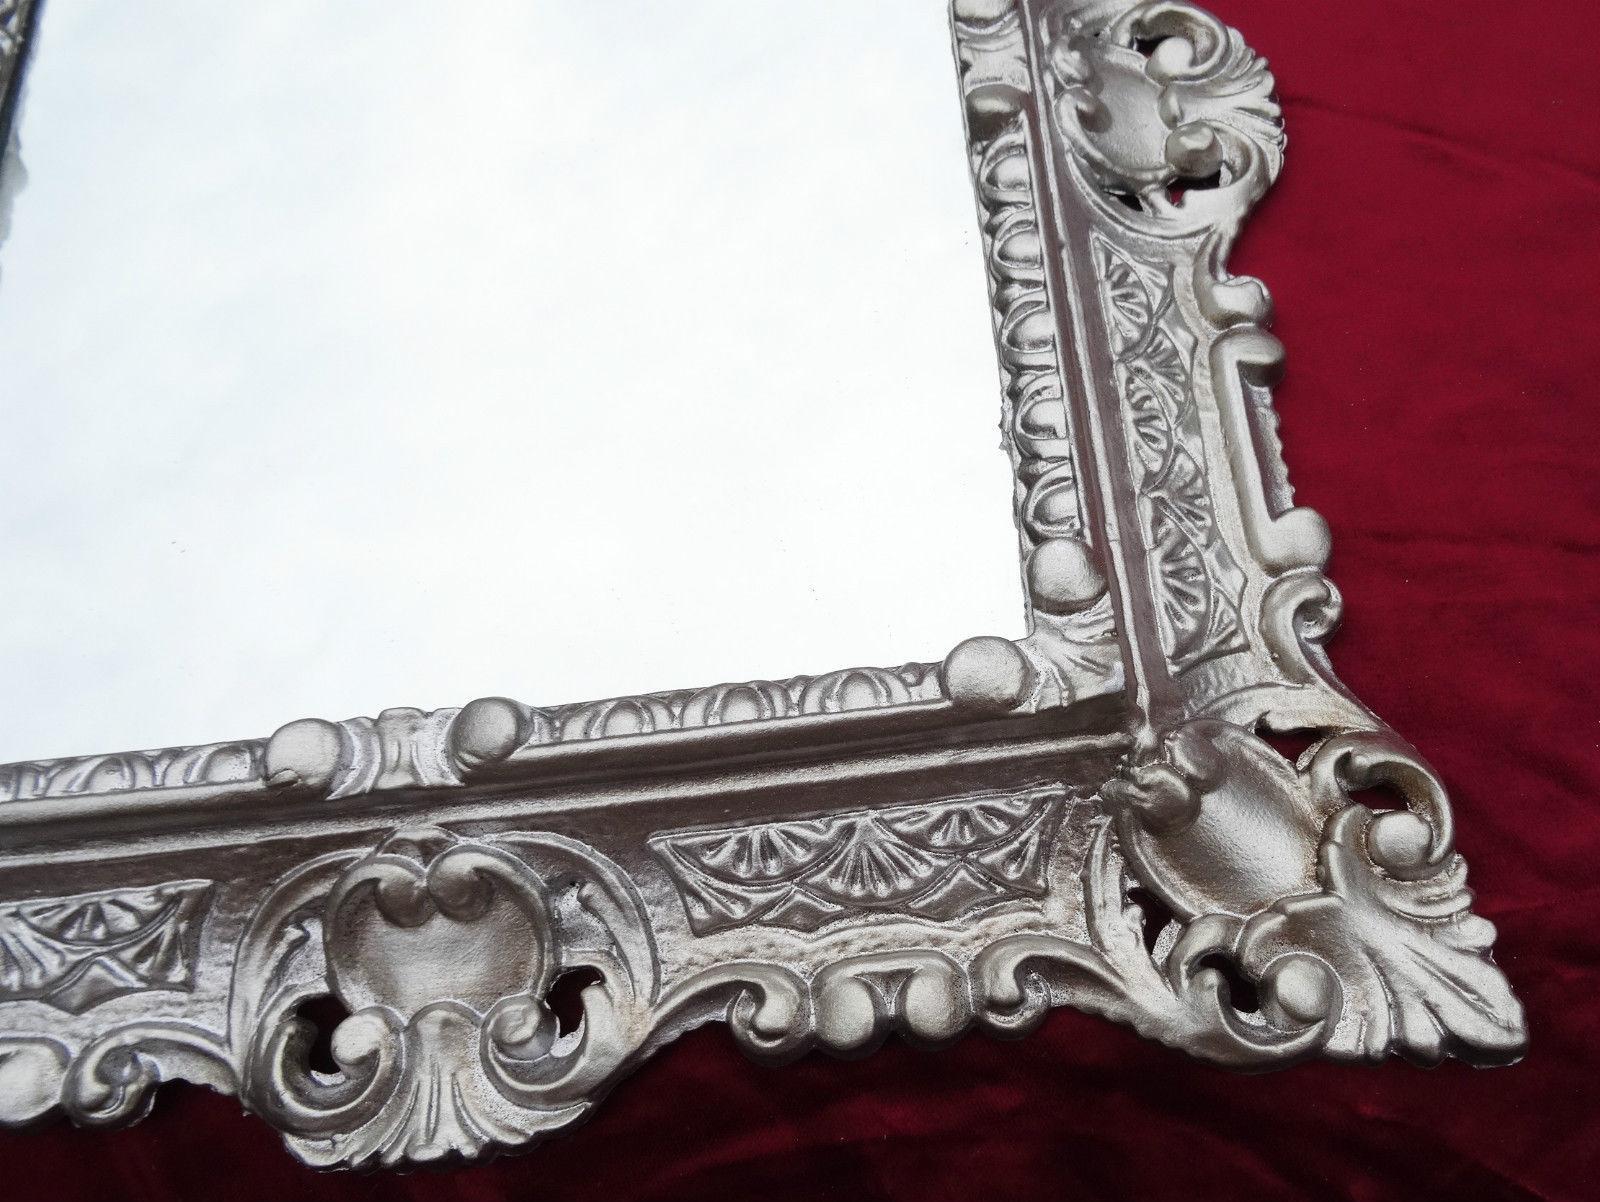 Spiegel wanddeko awesome wandspiegel badspiegel antik - Wanddeko spiegel ...